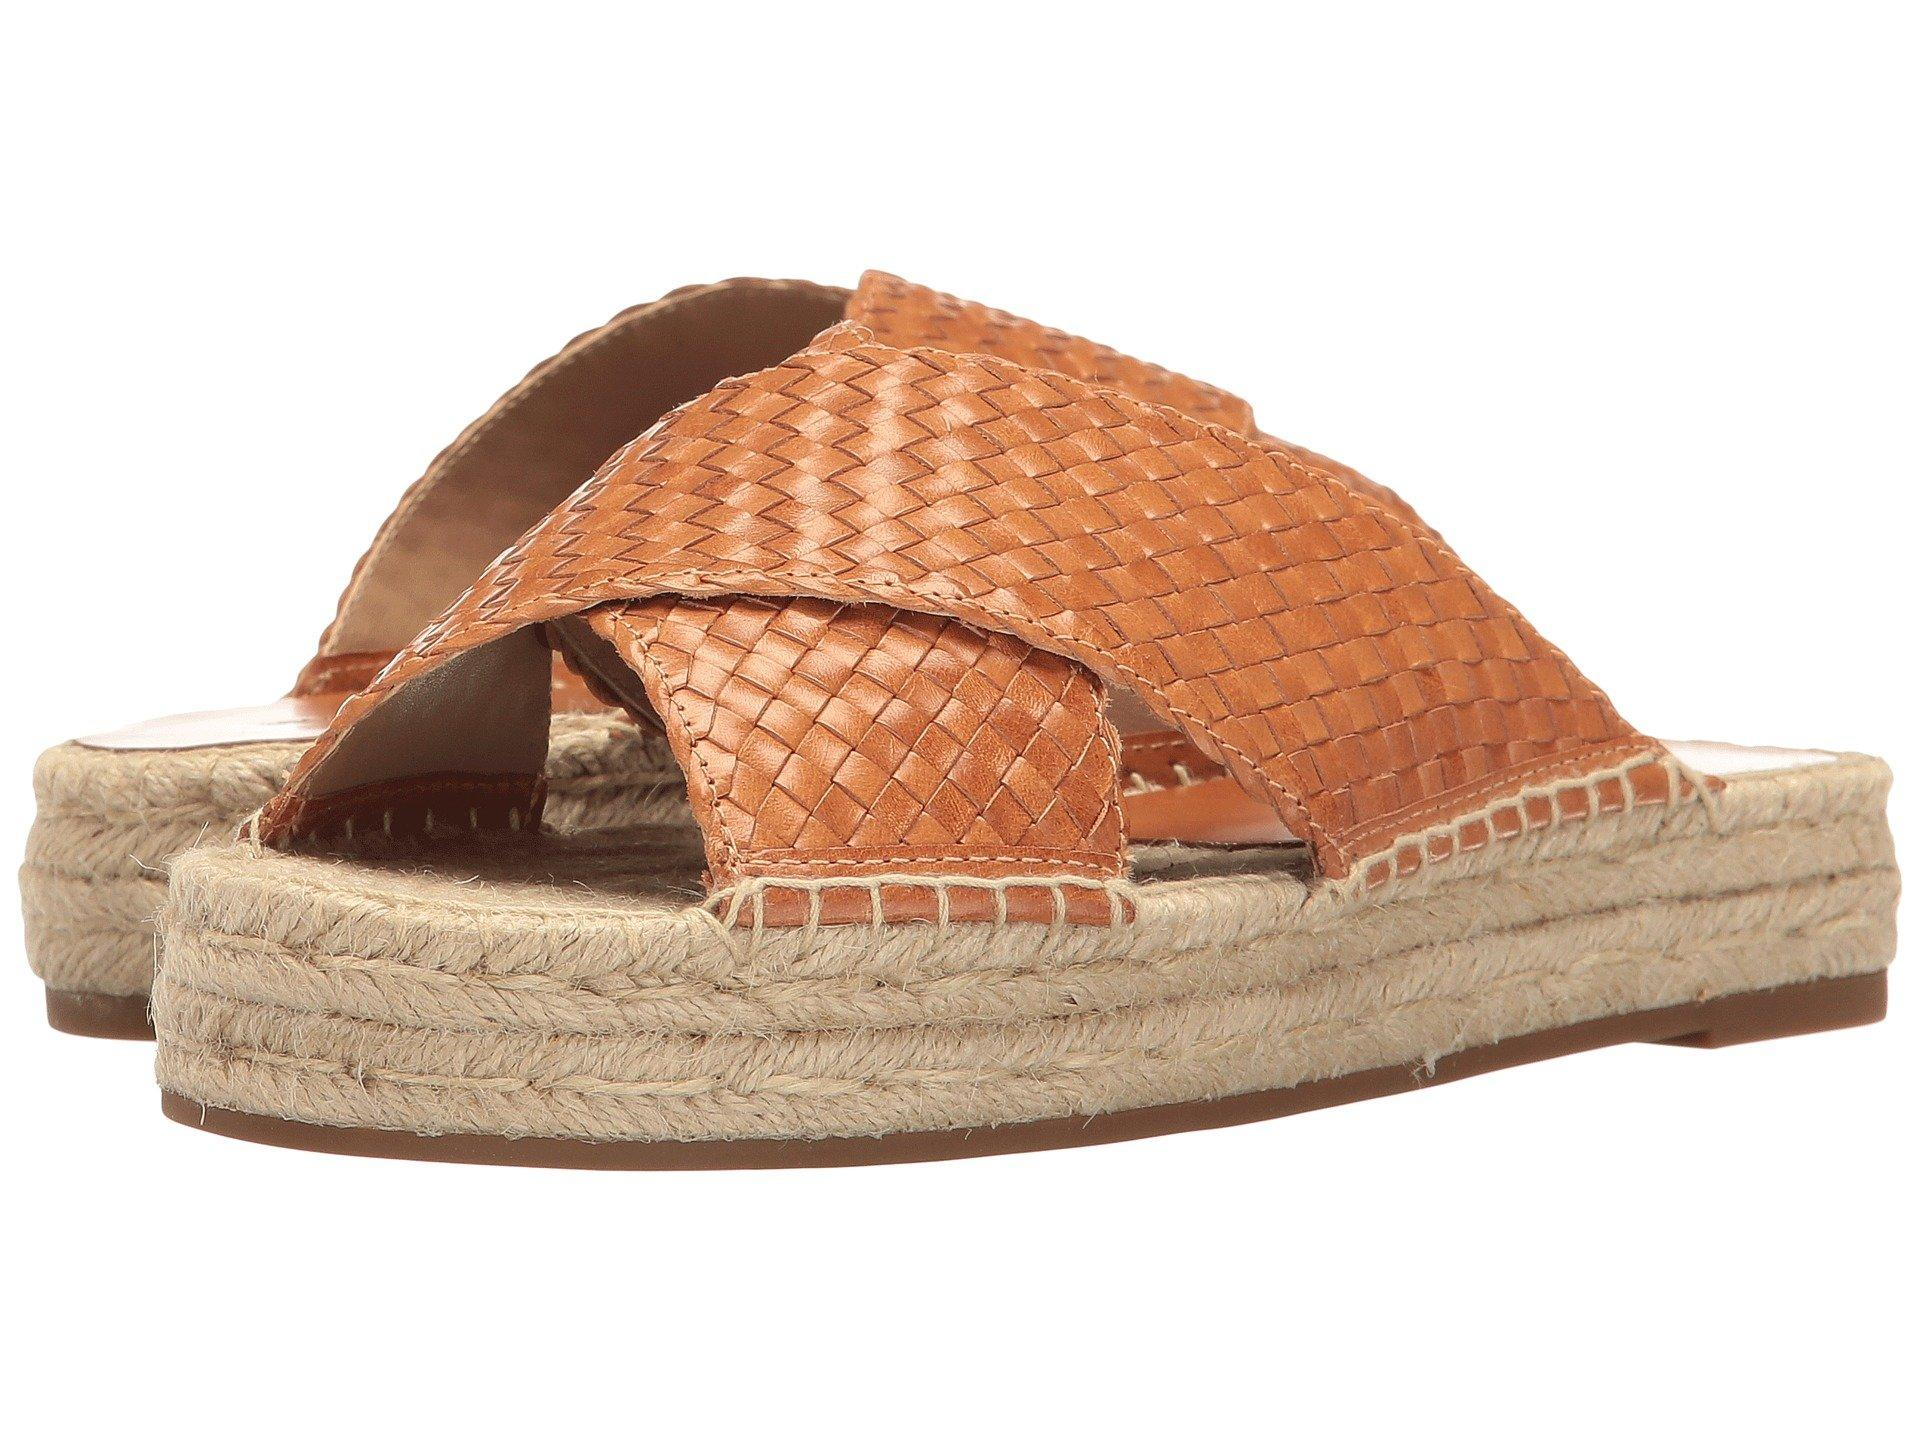 21f0b16badb251 Michael Kors Destin Woven Leather Espadrille Platform Slide Sandals In  Rattan